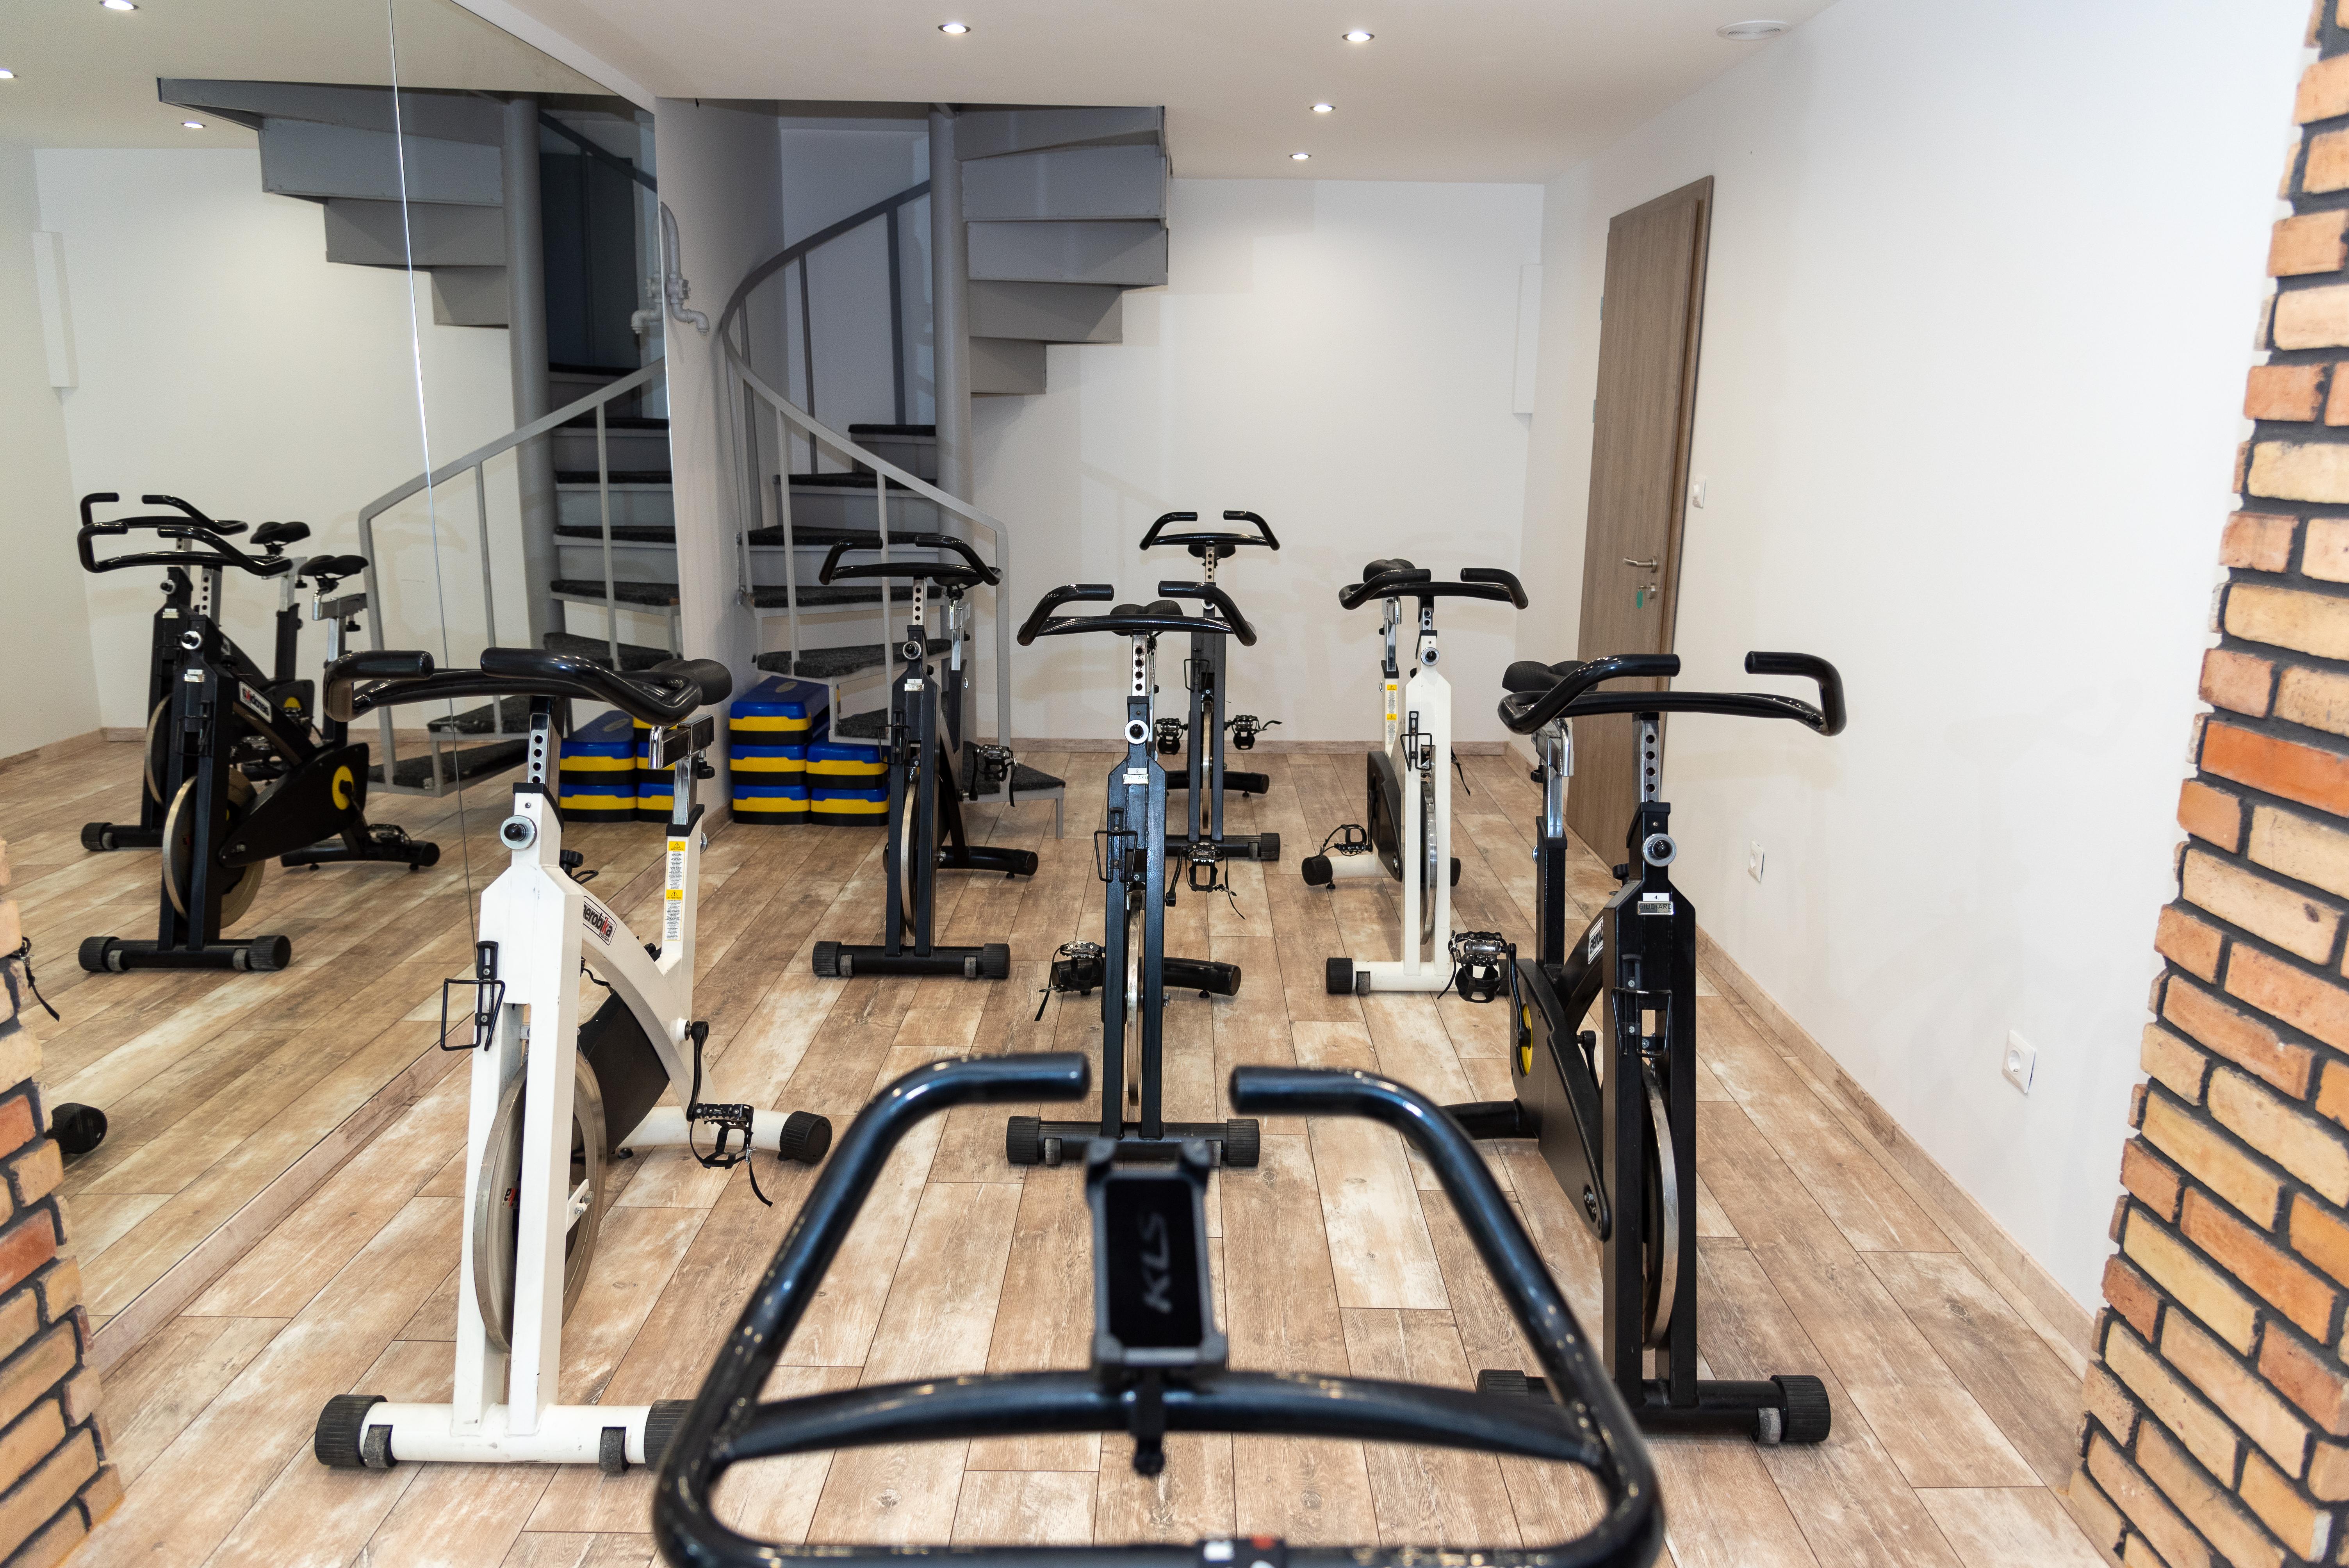 Kisterem - indoor cycling